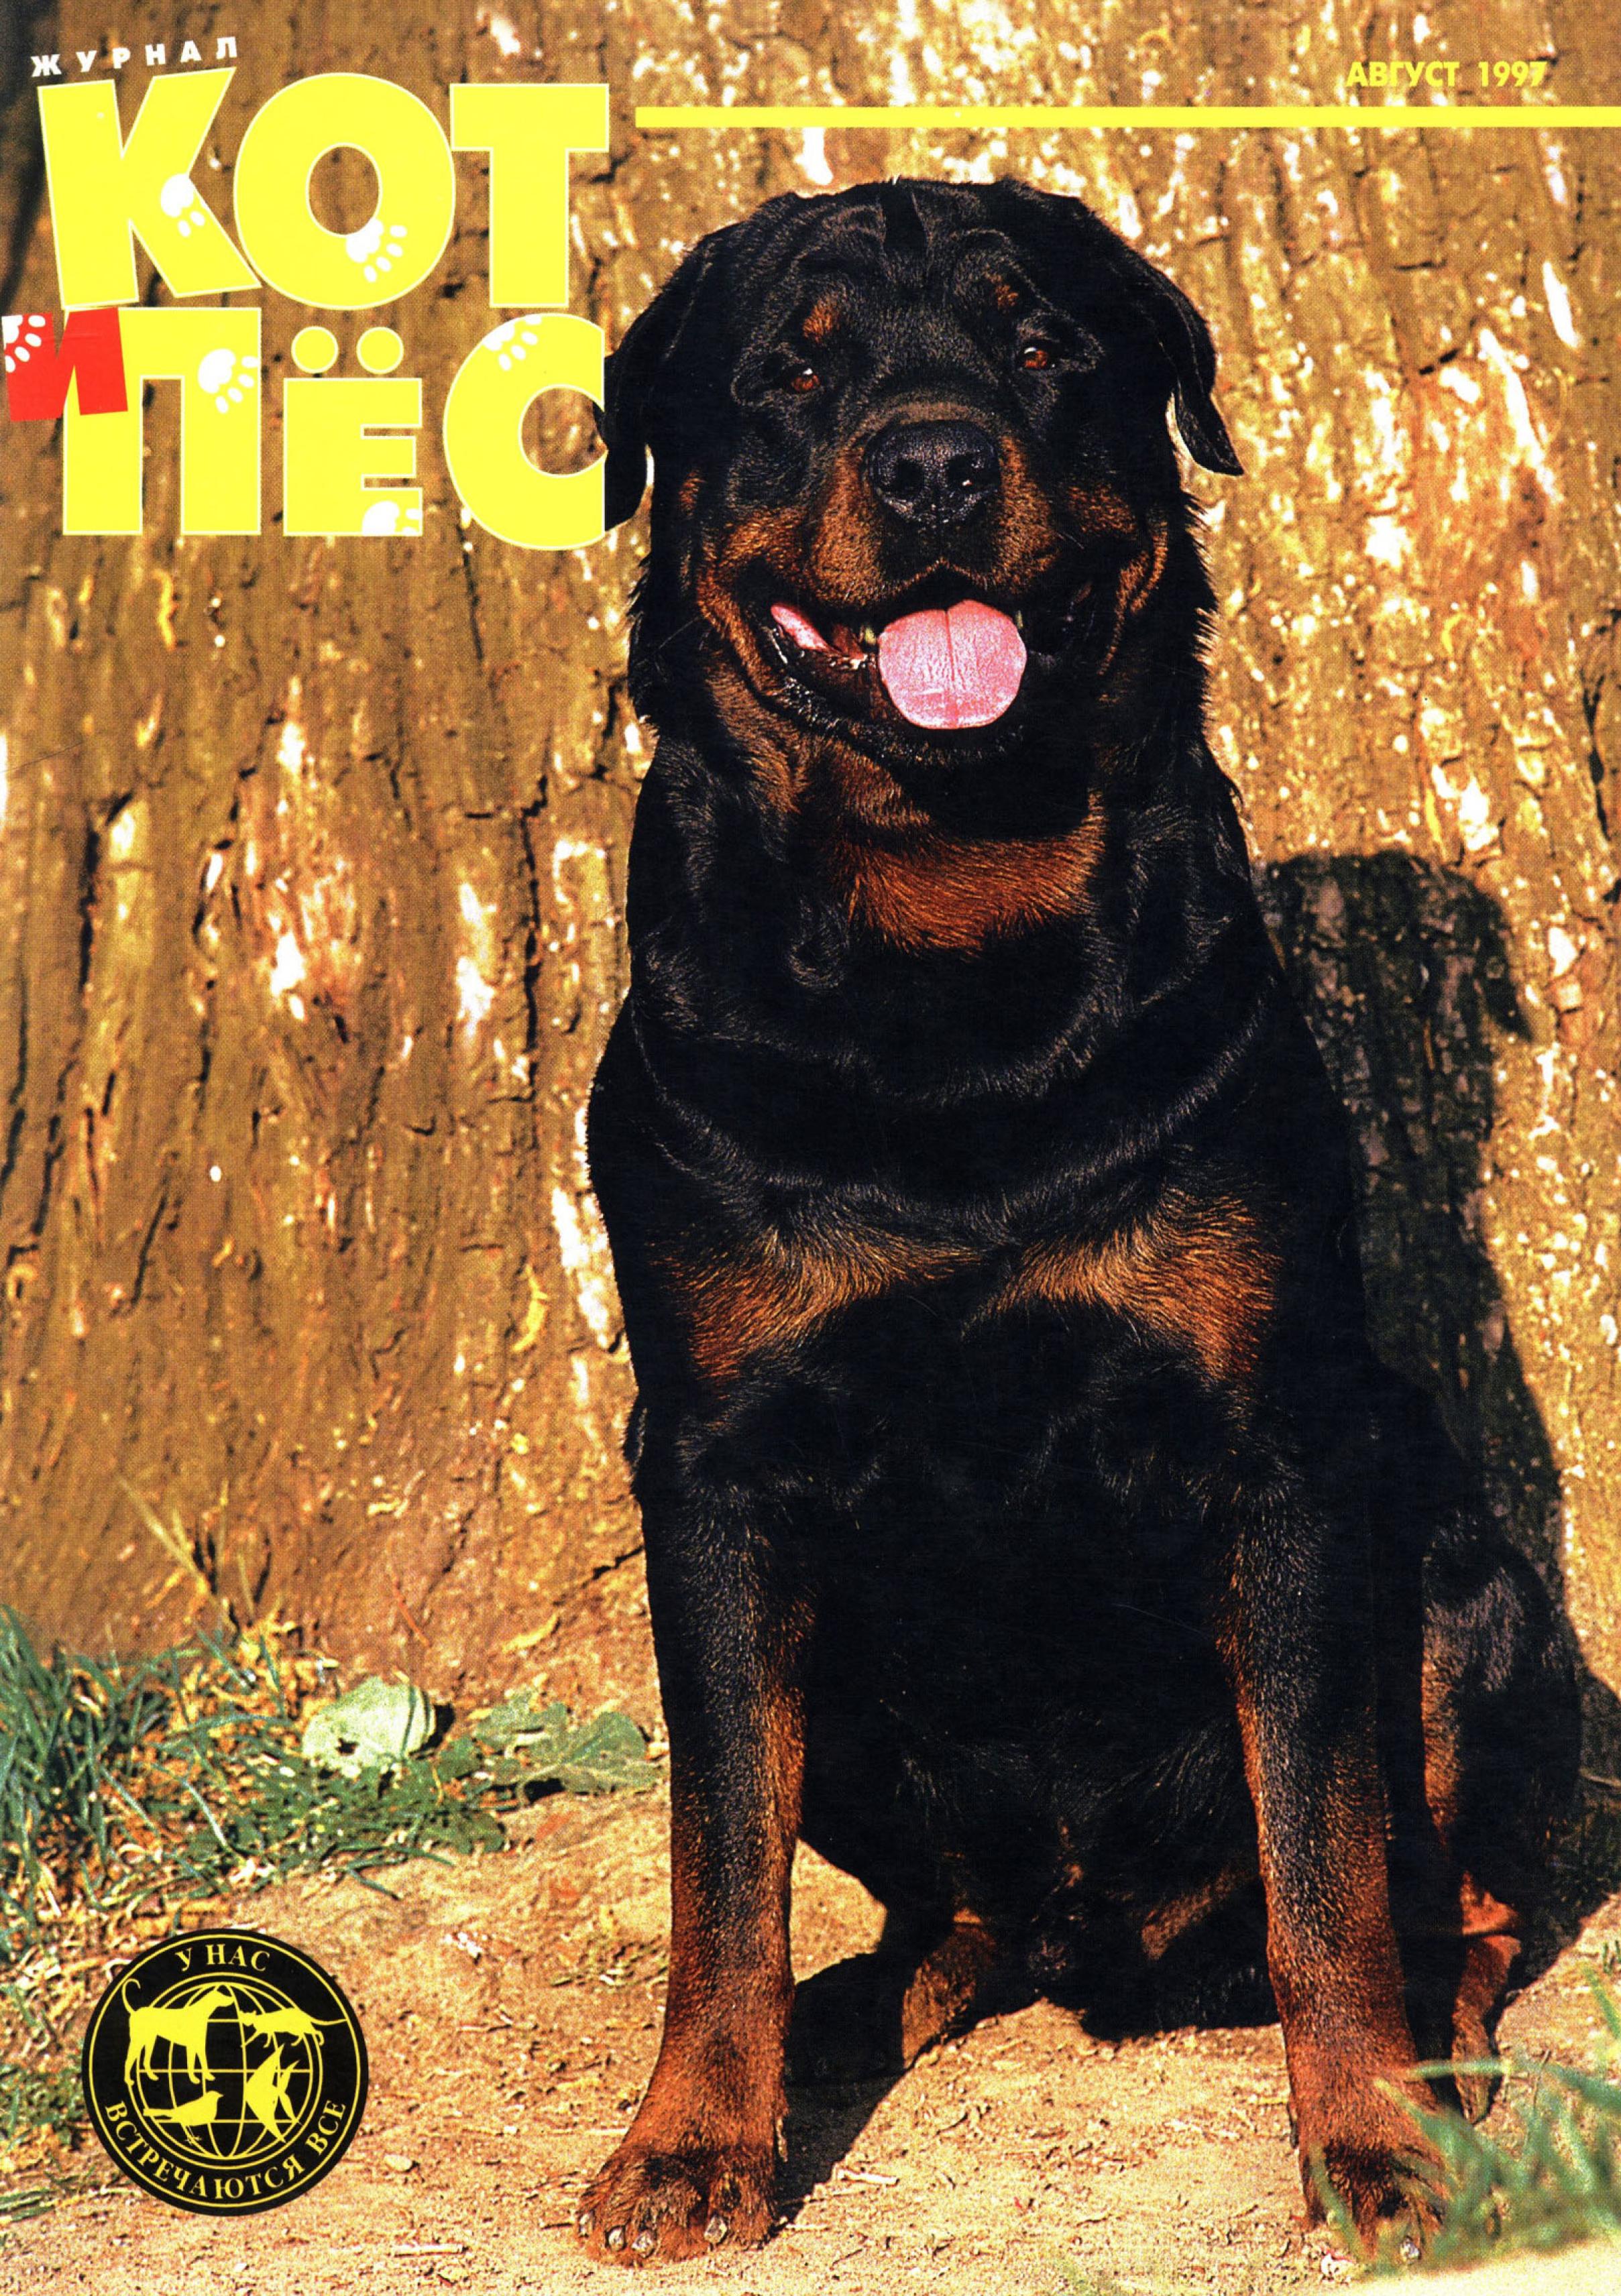 Кот и Пёс № 08/1997